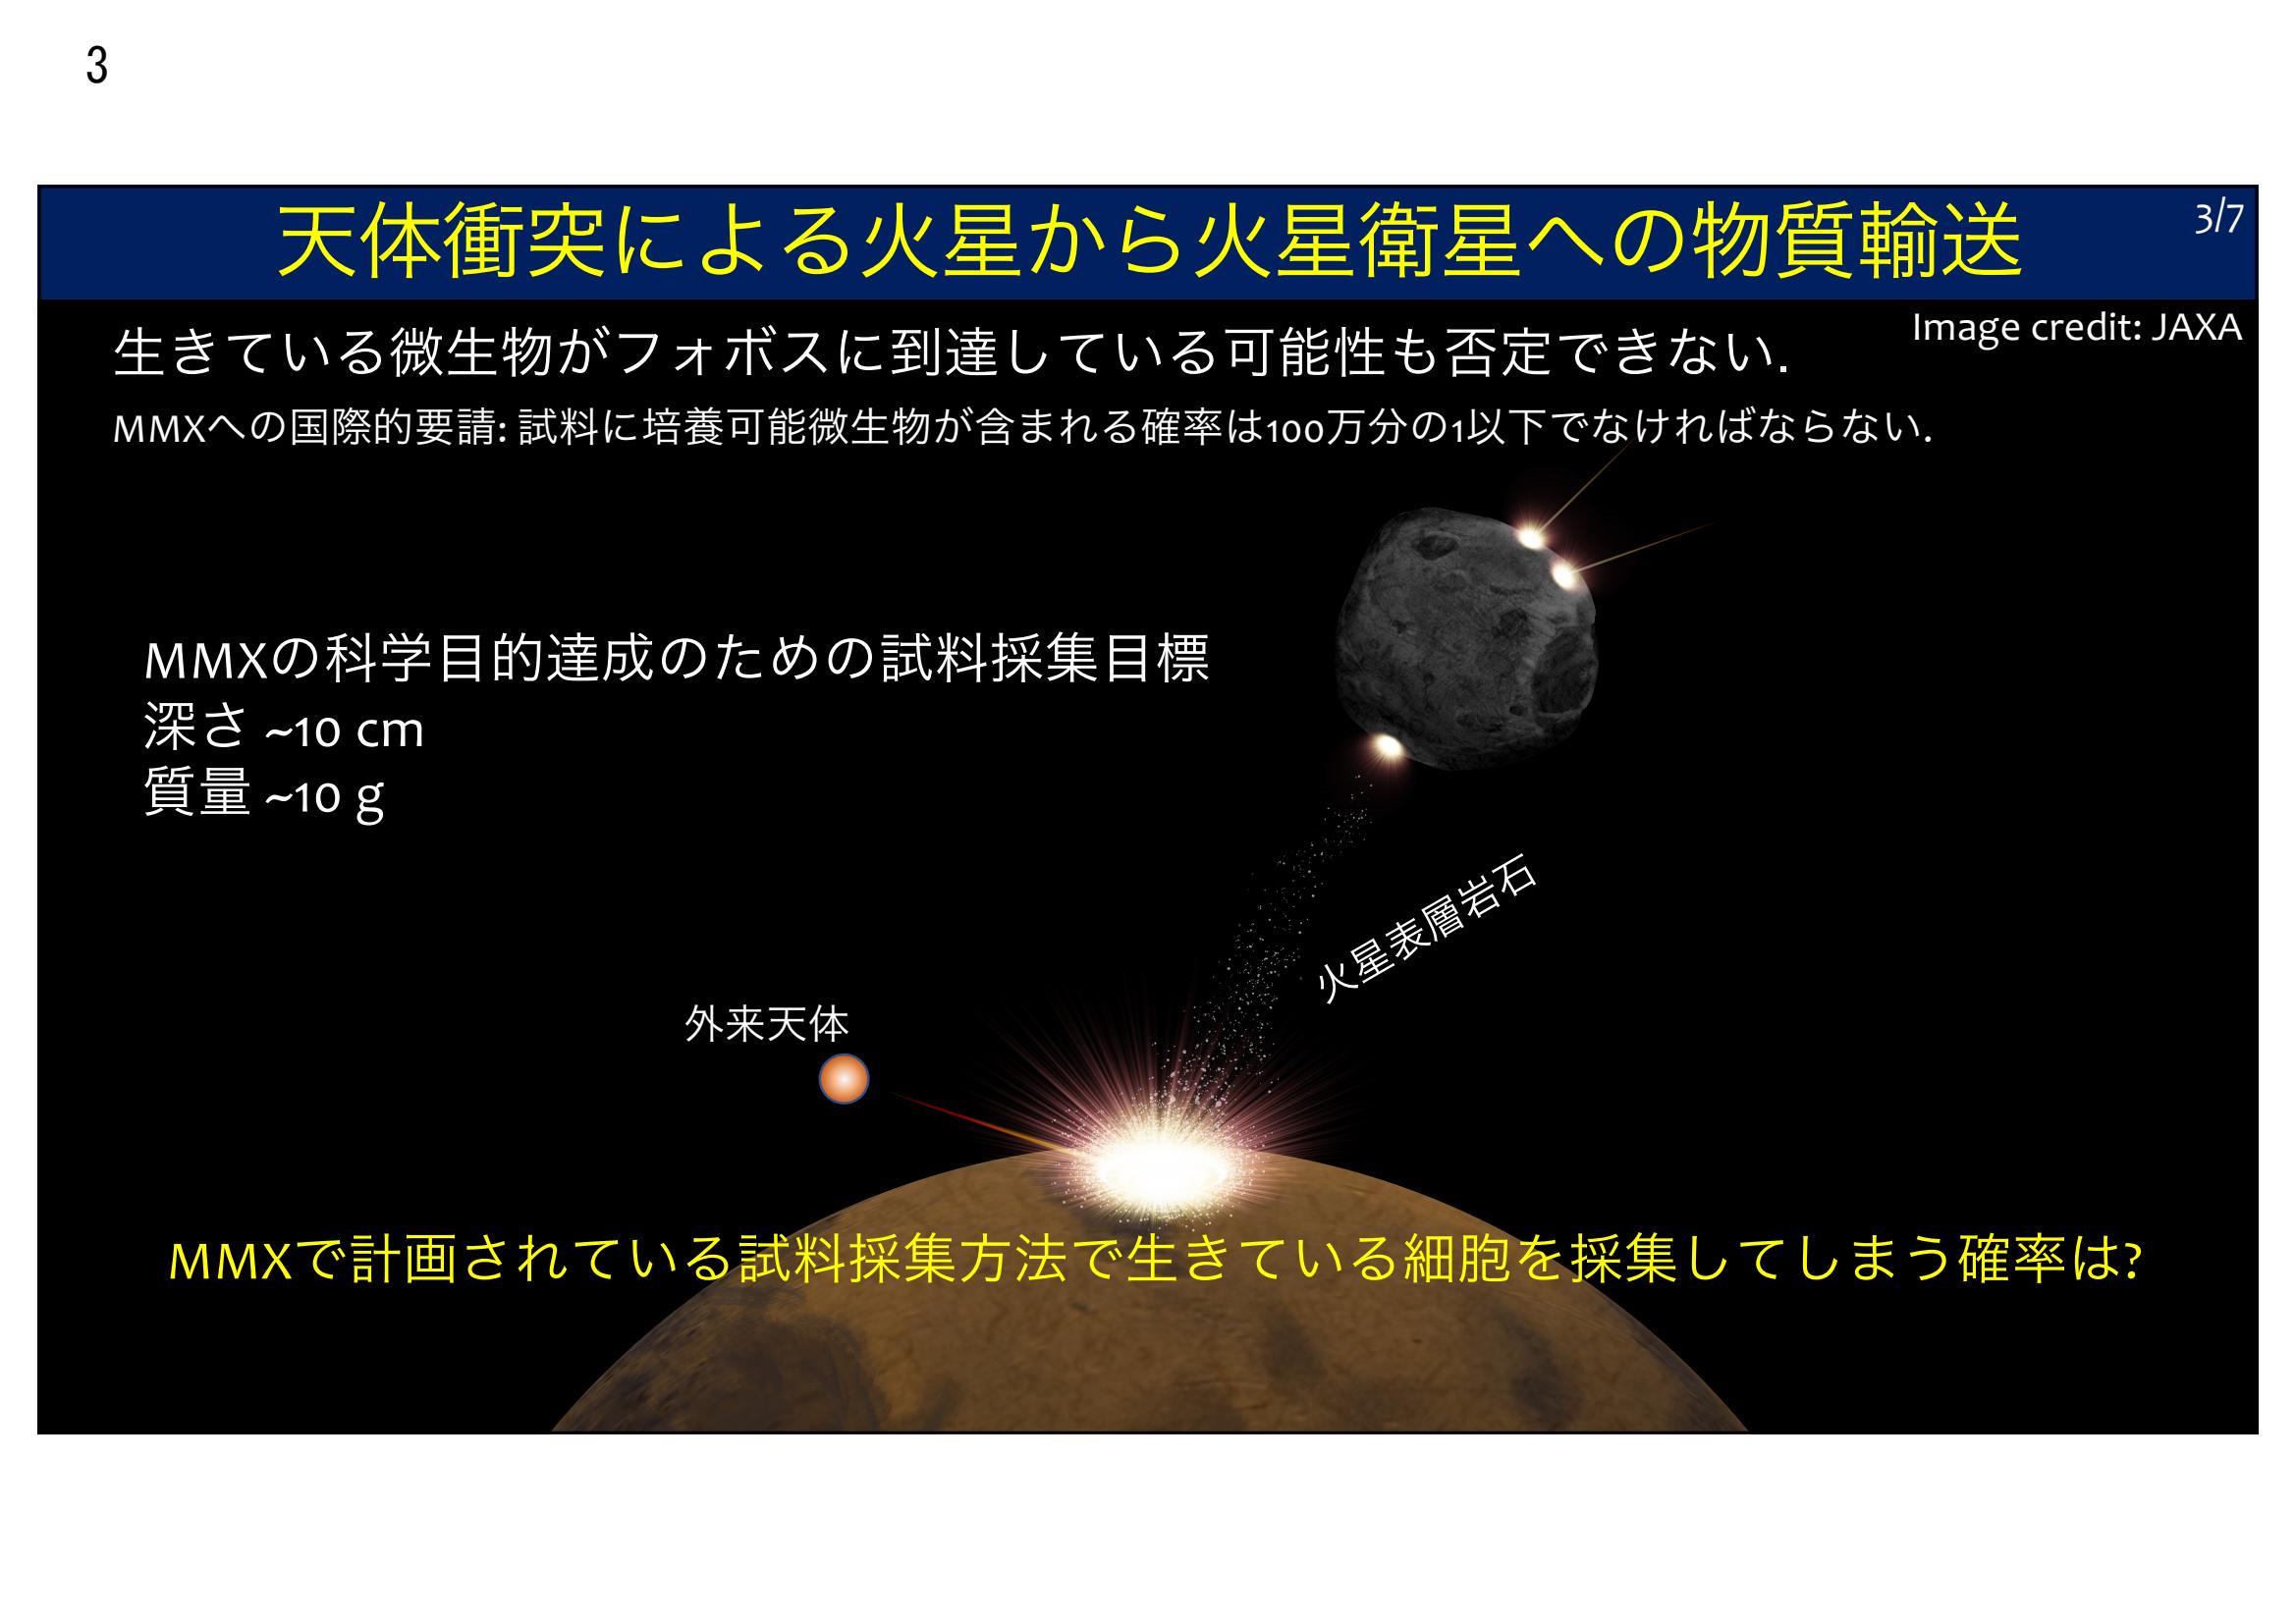 f:id:Imamura:20210819095350p:plain